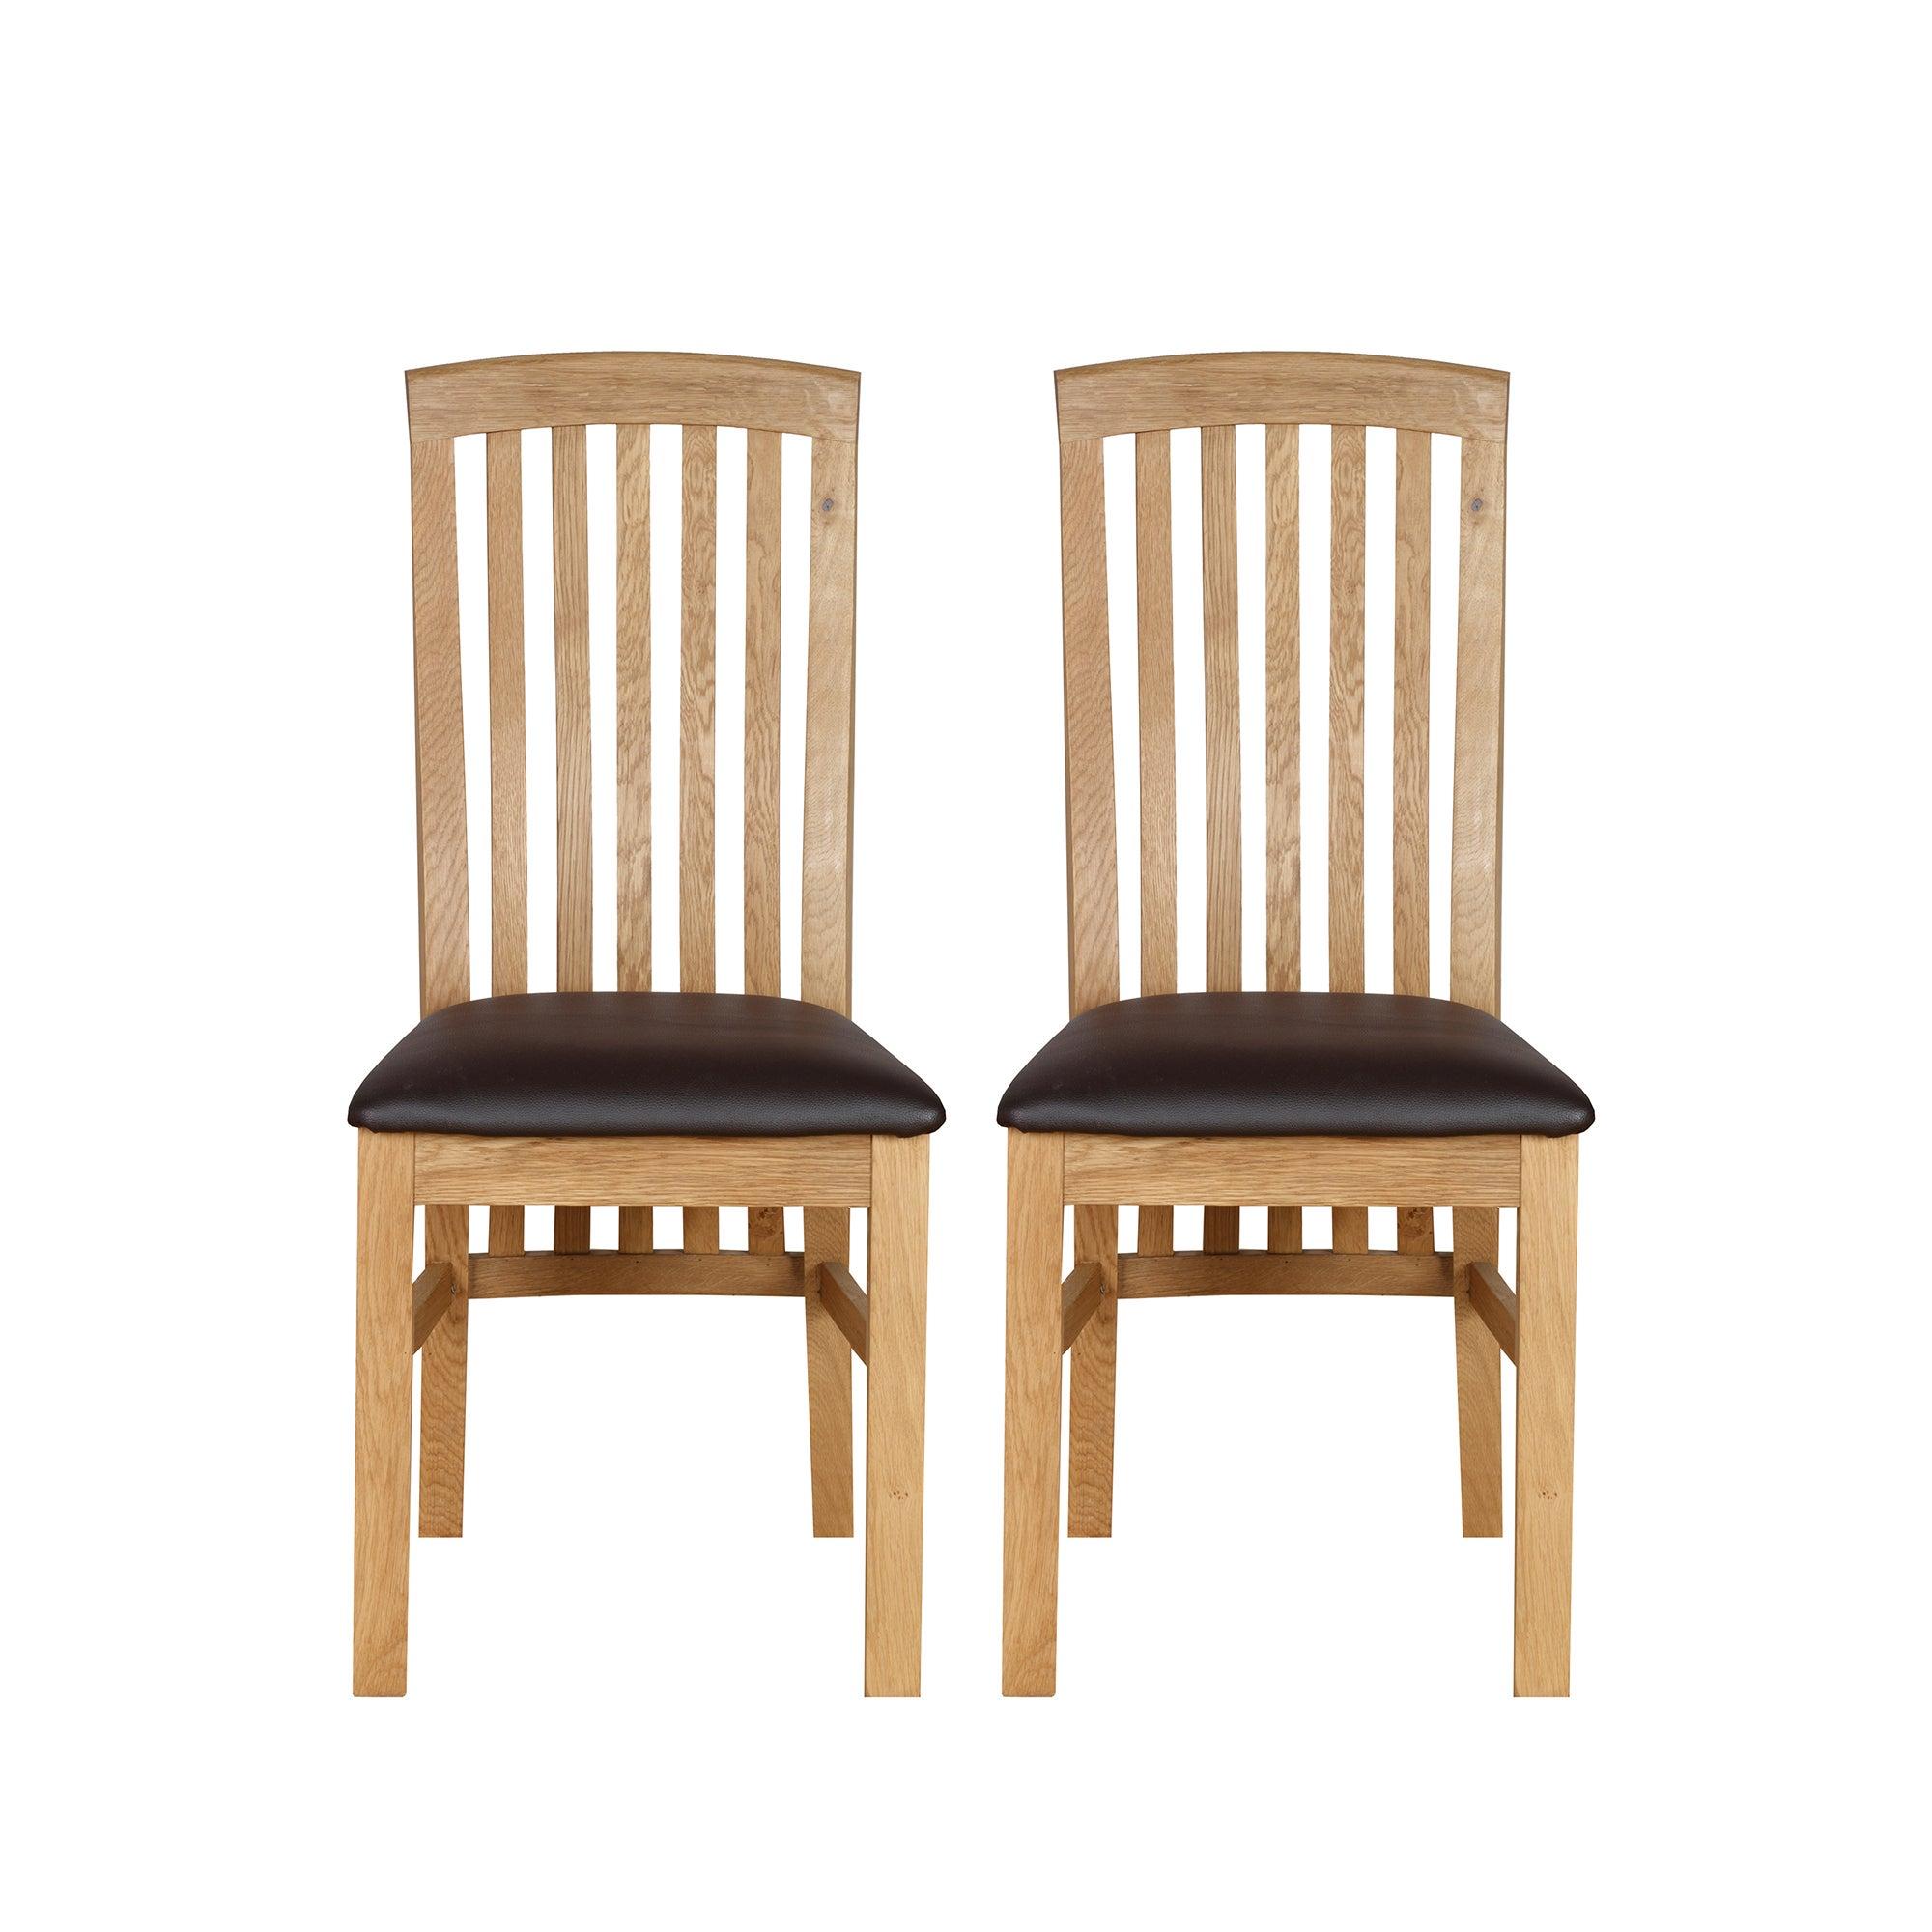 gainsborough pair of oak dining chairs dunelm. Black Bedroom Furniture Sets. Home Design Ideas